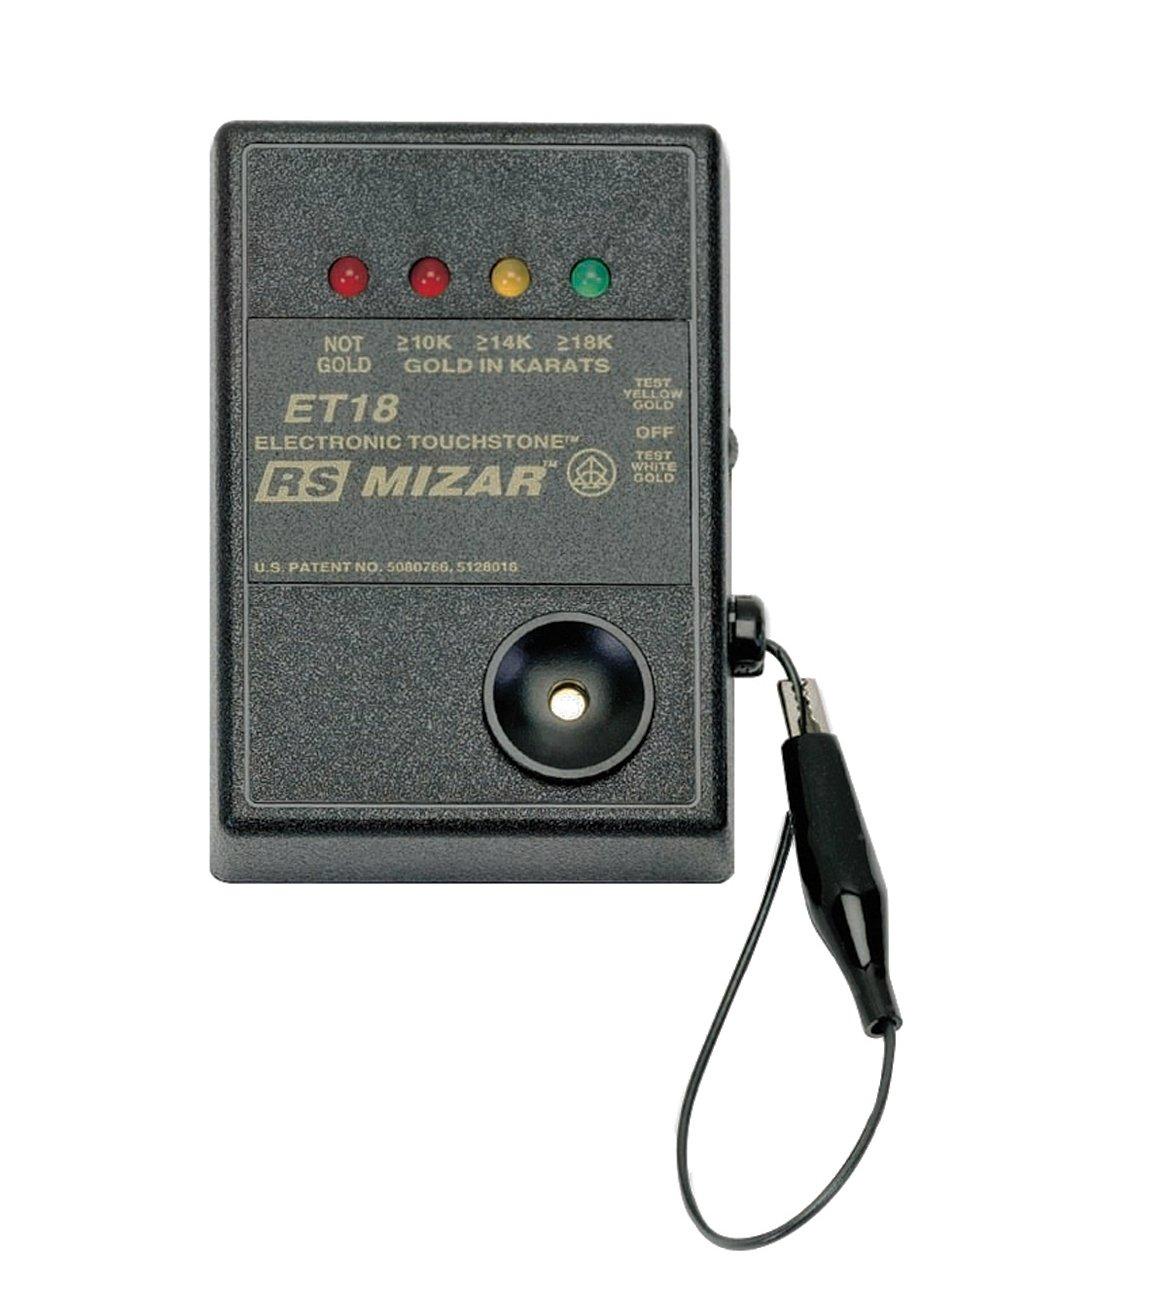 ET-18 Mizar Gold Tester Battery Operated Electronic Gold Karat Purity Value 10K 14K 18K Tester PMC Supplies TES-174.00